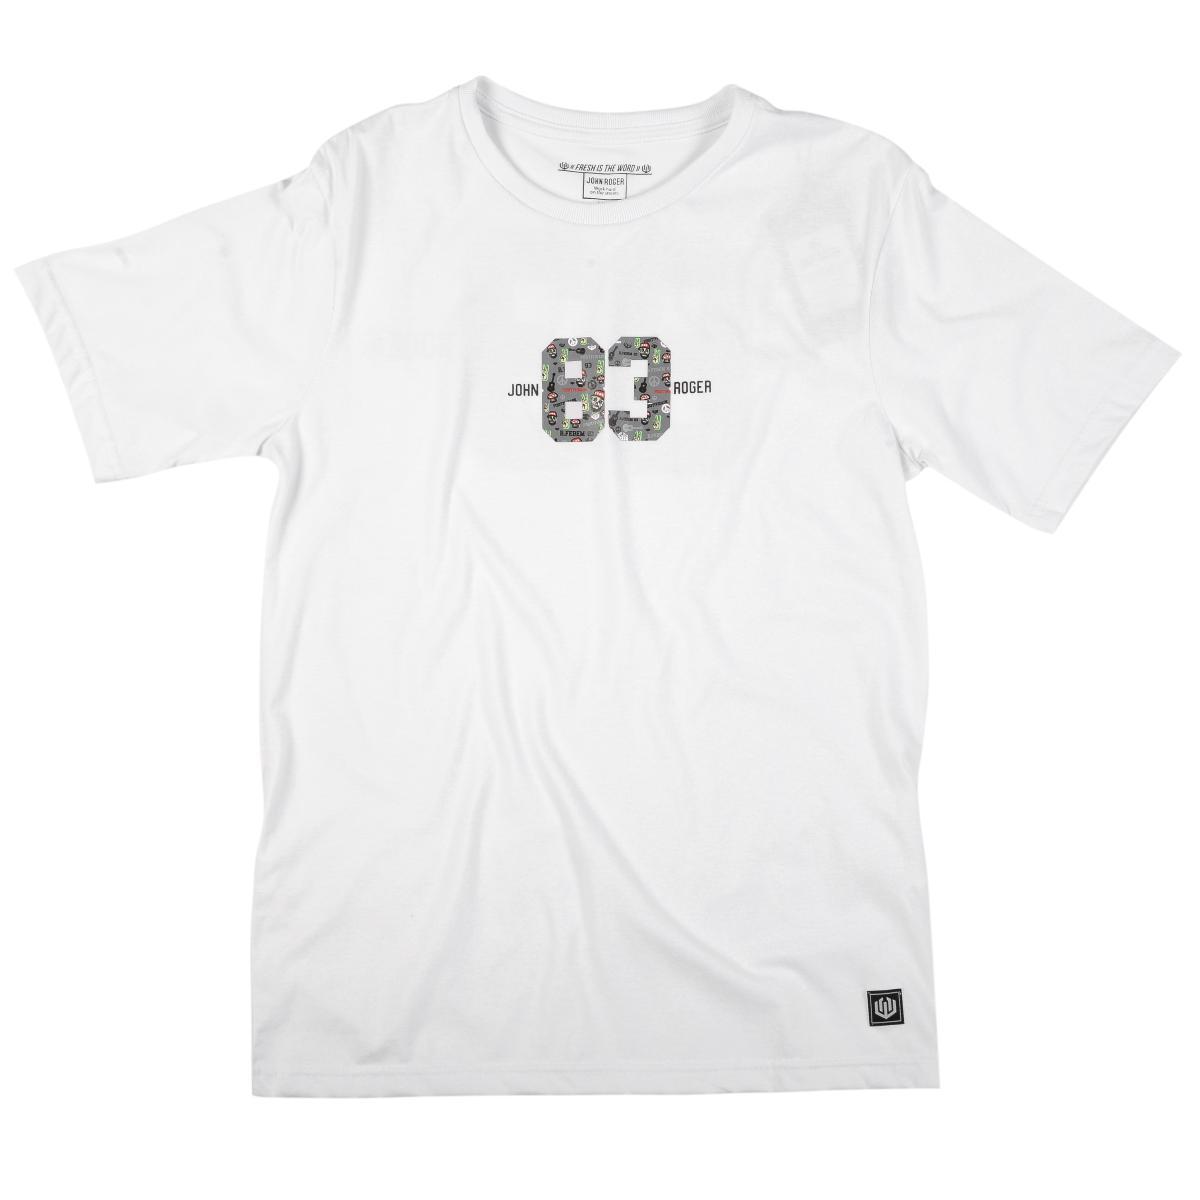 Camiseta John roger x Febem Pro Model - branco